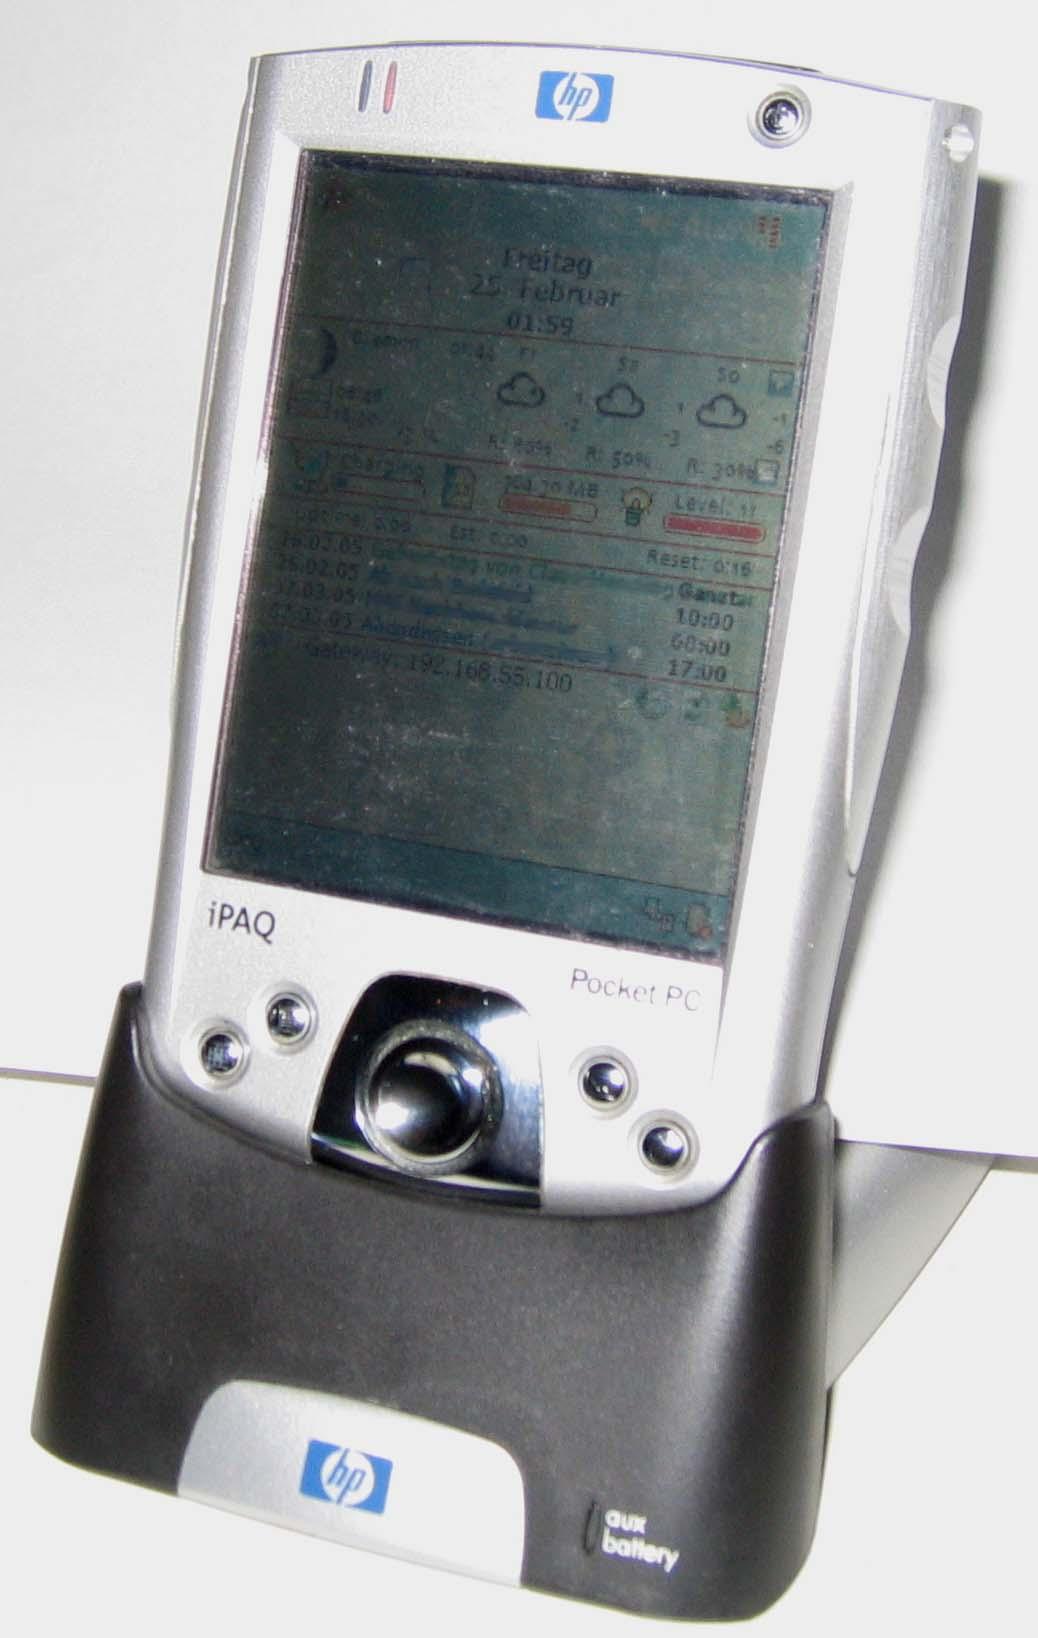 Pocket pc 2003 hp ipaq инструкция скачать